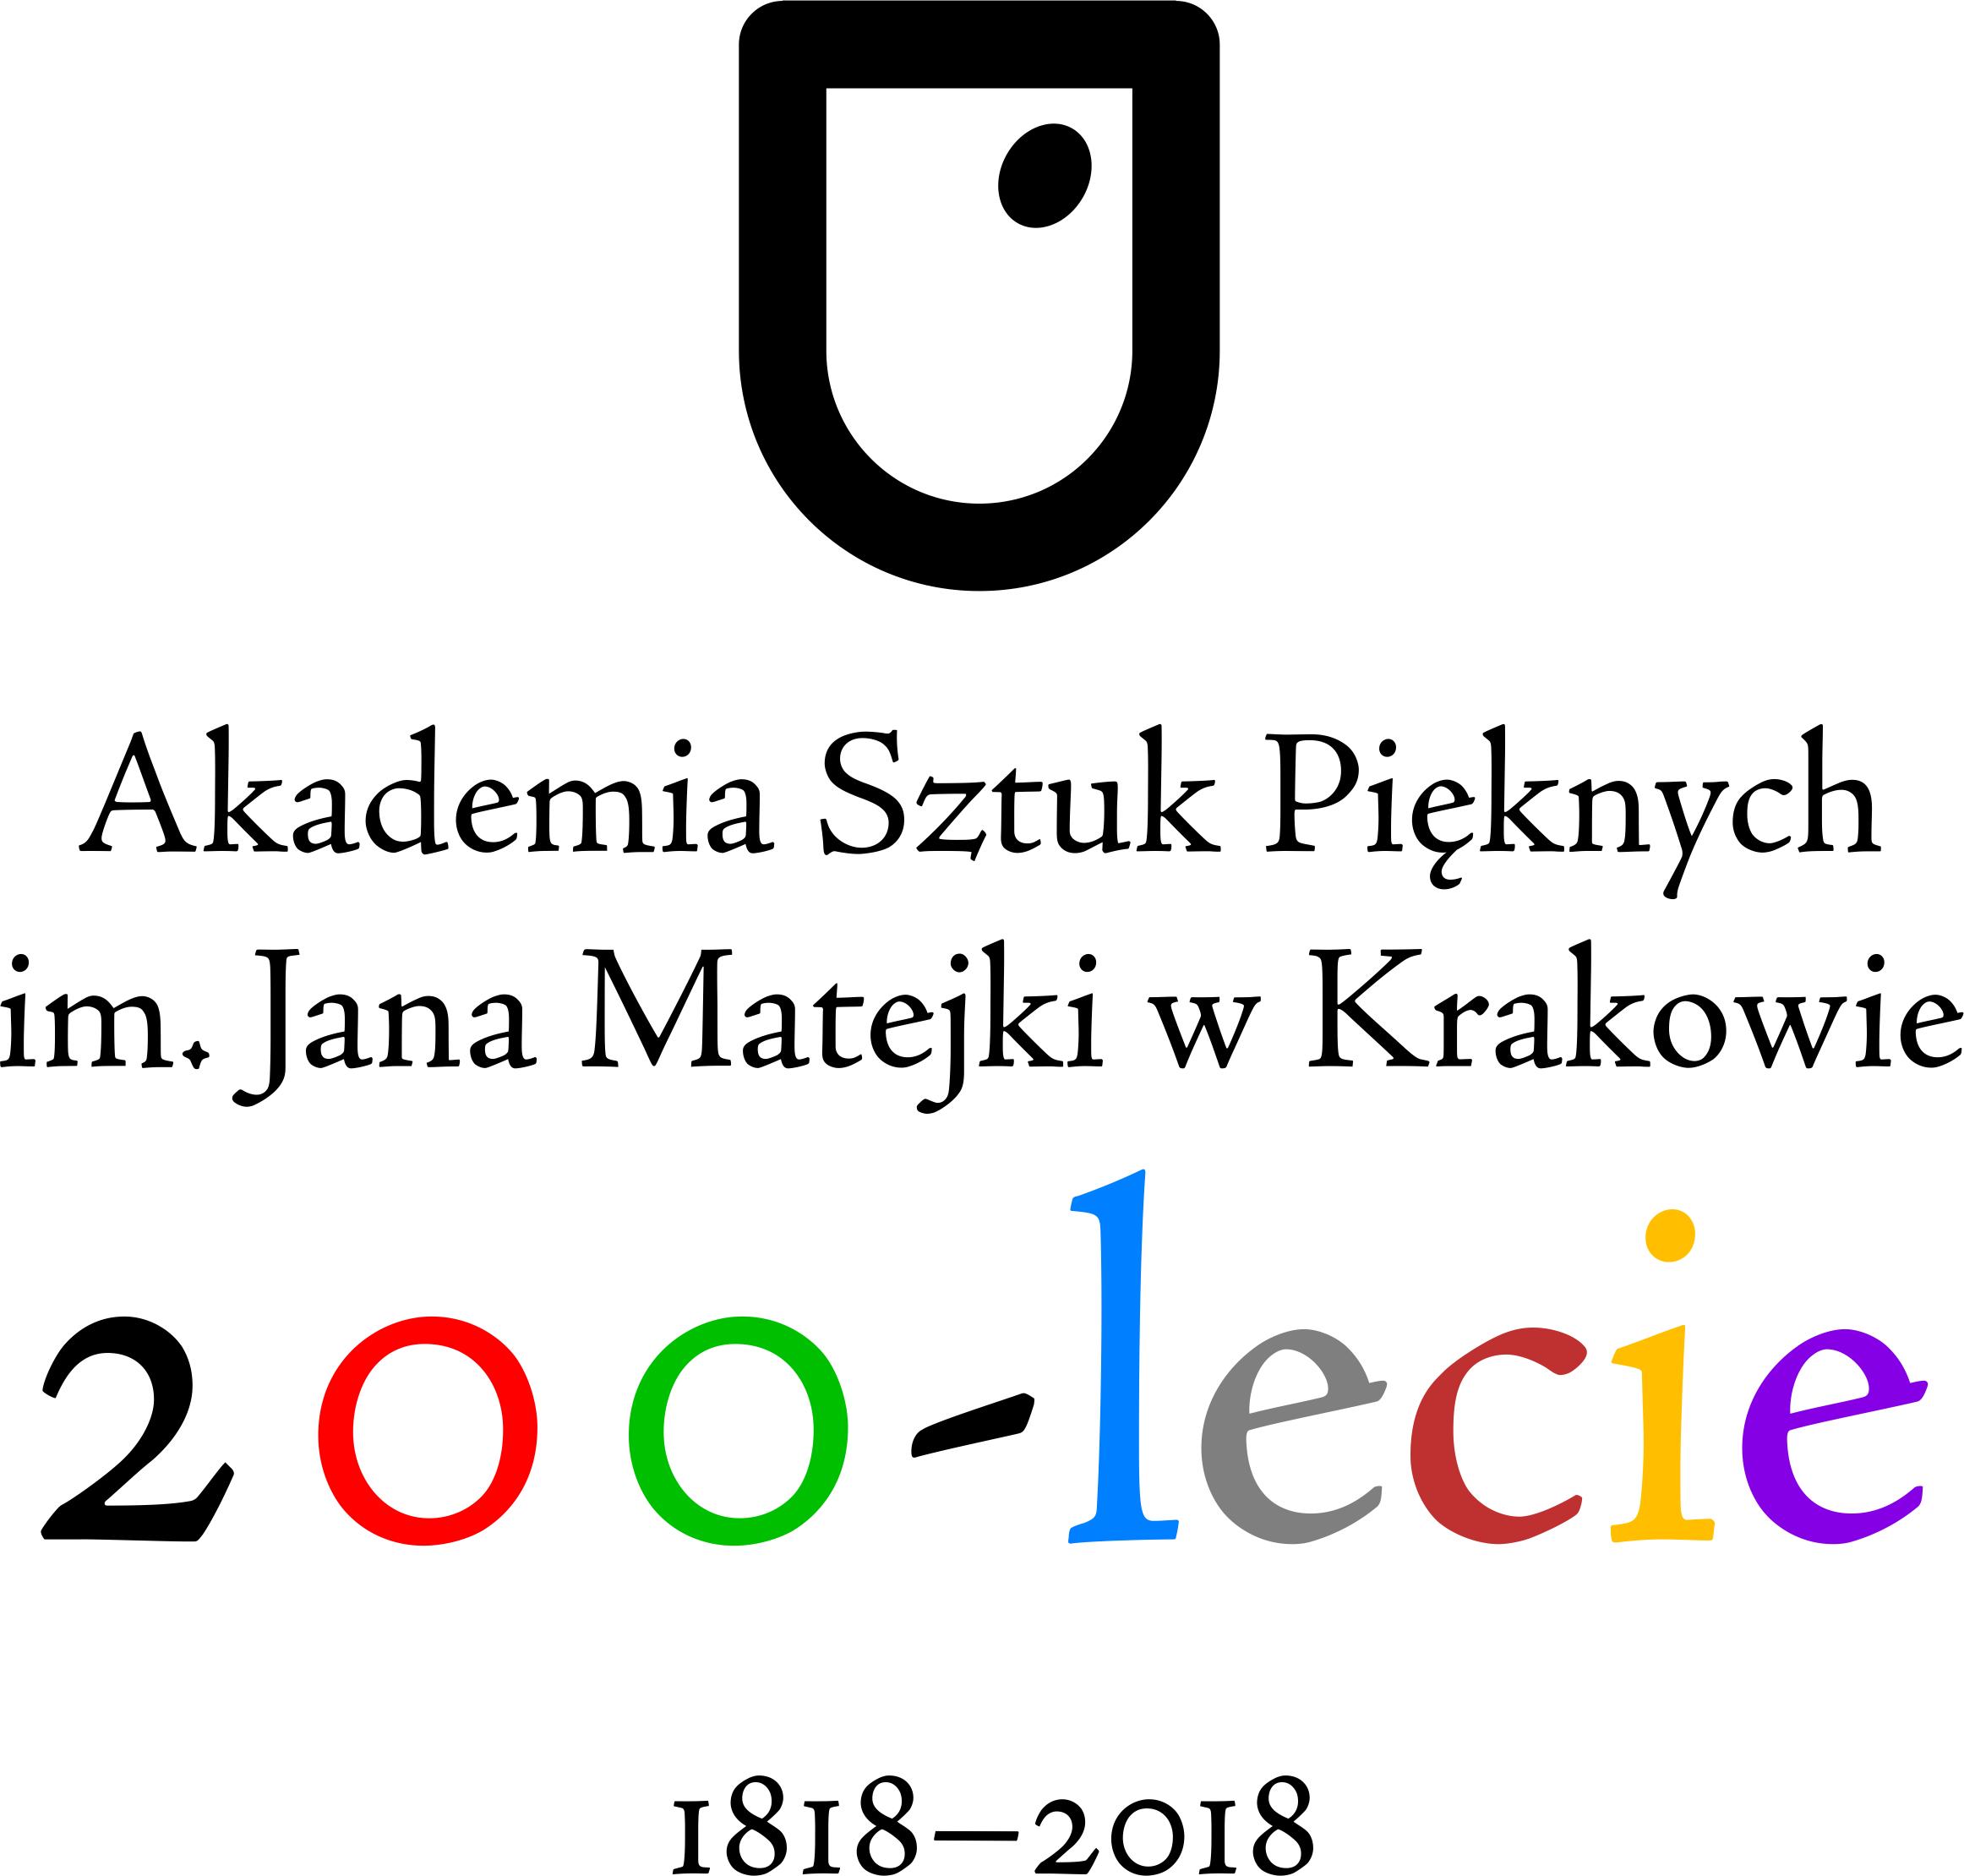 http://m.wmwm.pl/2017/07/orig/logo-jubileuszowe-asp-5761.jpg